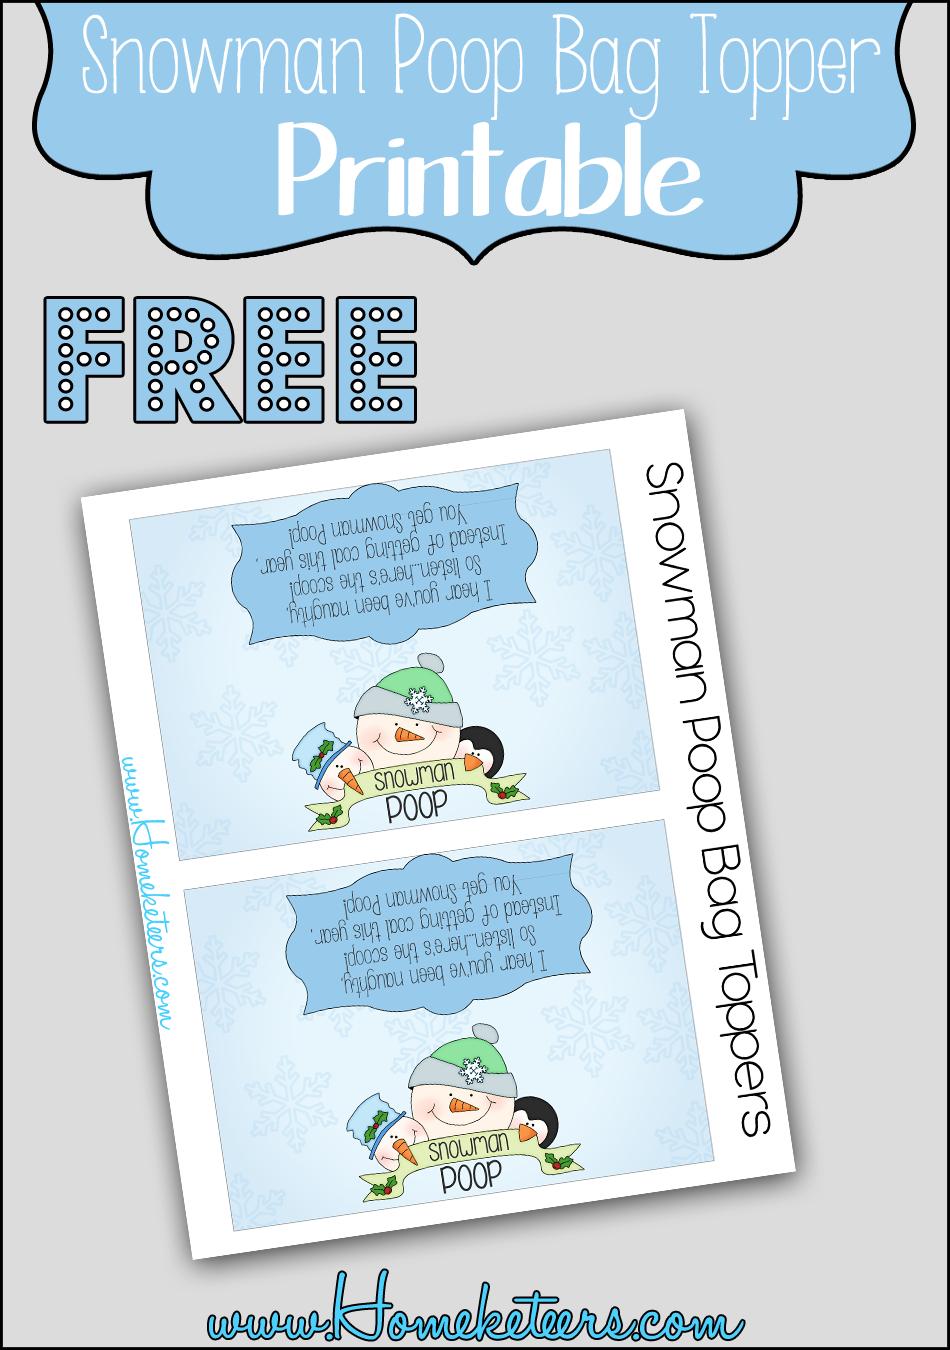 Snowman Poop Bag Topper ~ Free Printable - Free Printable Christmas Bag Toppers Templates